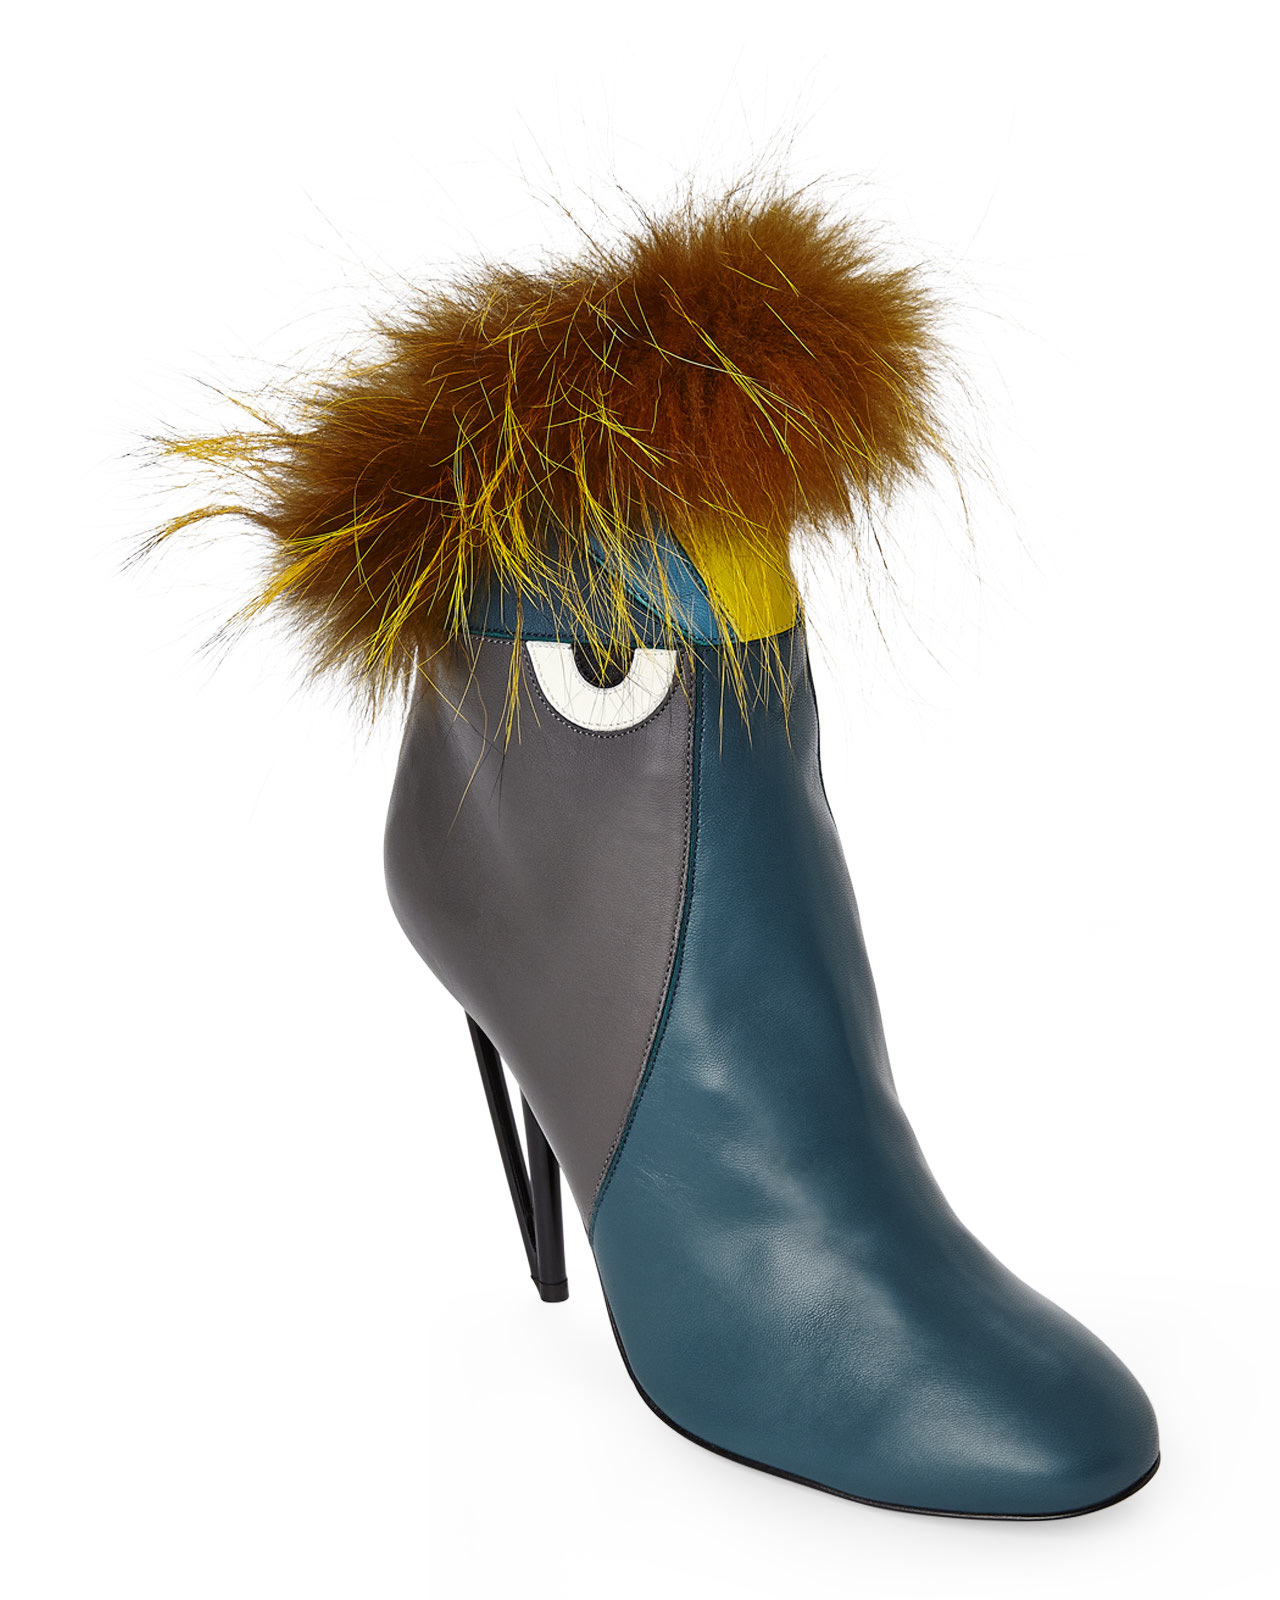 Fendi Teal Amp Grey Monster Fur Trimmed Booties In Blue Lyst